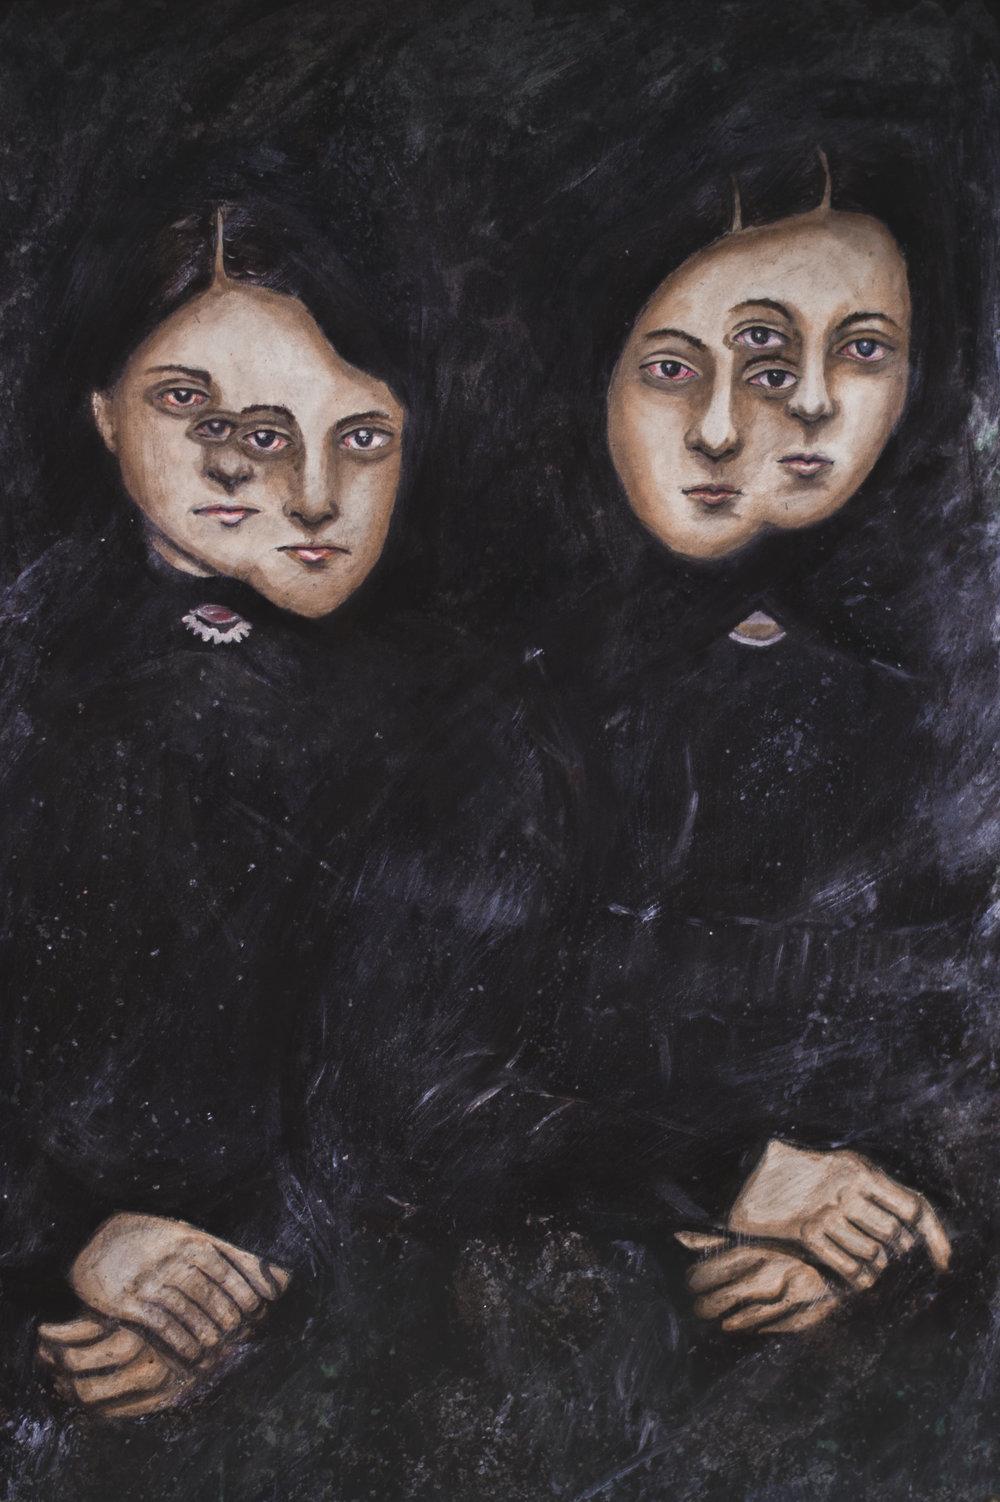 'Twins' - 2014